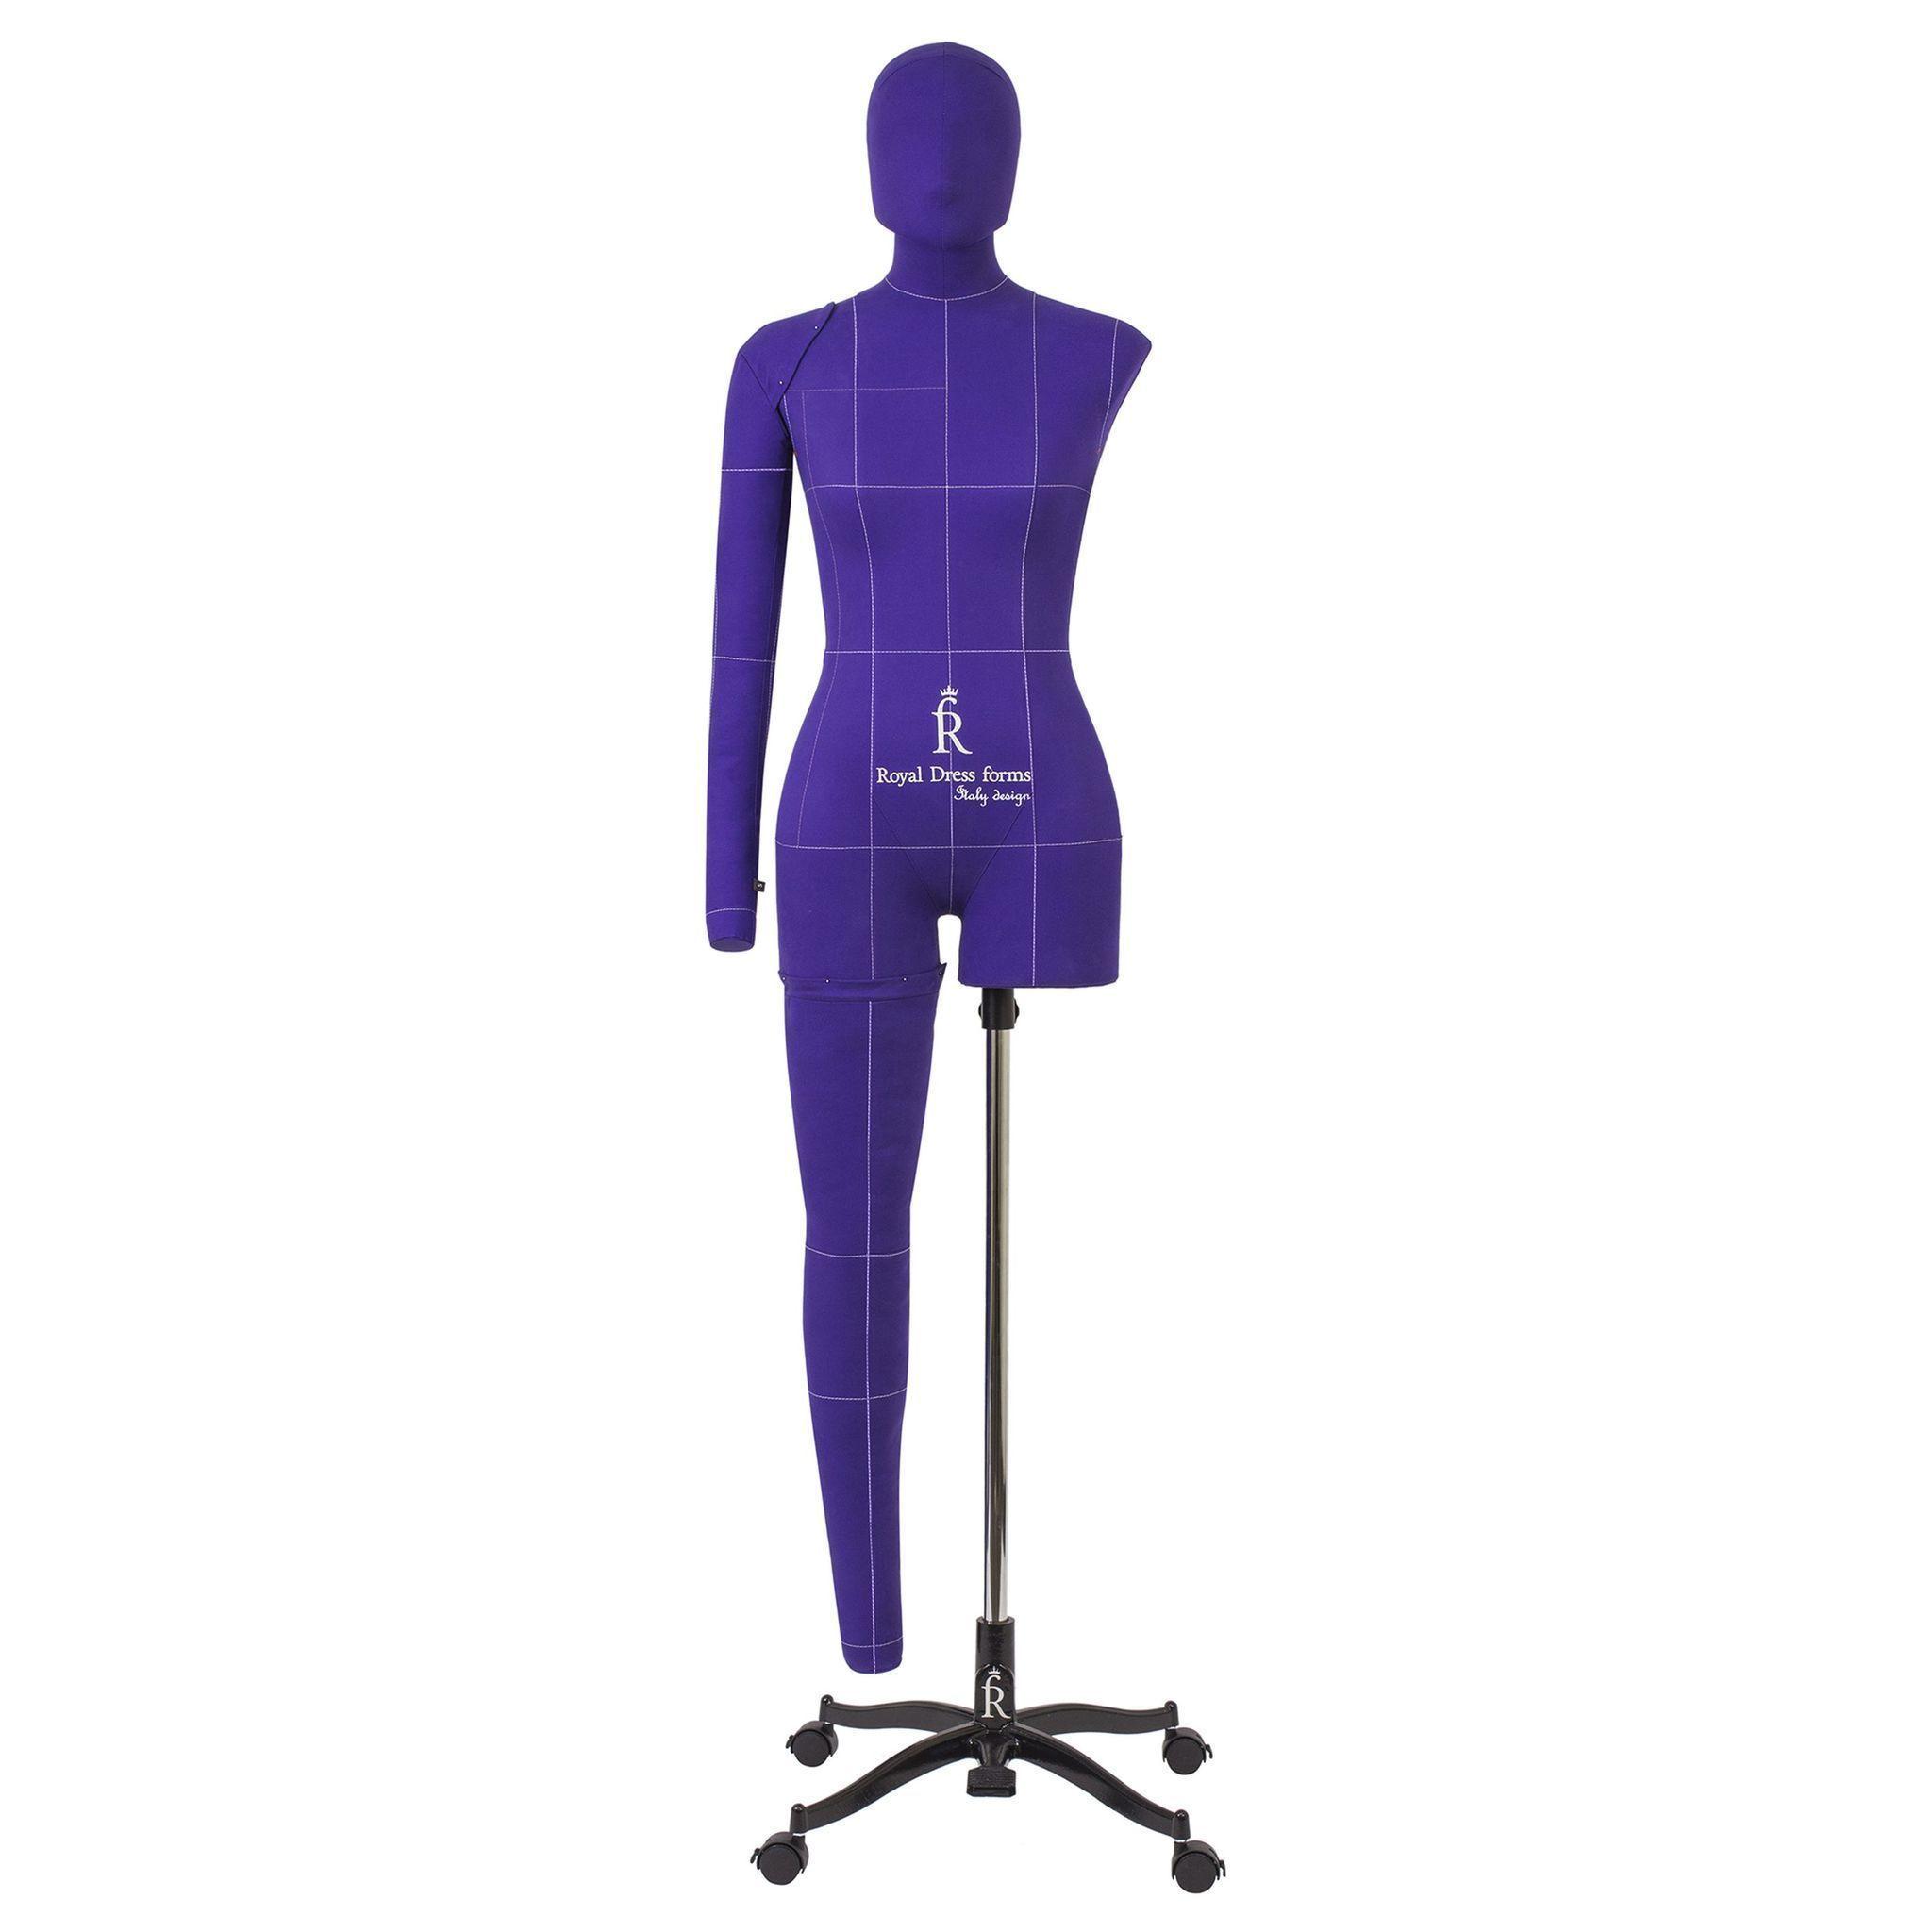 Манекен портновский Моника, комплект Арт, размер 50, ФиолетовыйФото 3